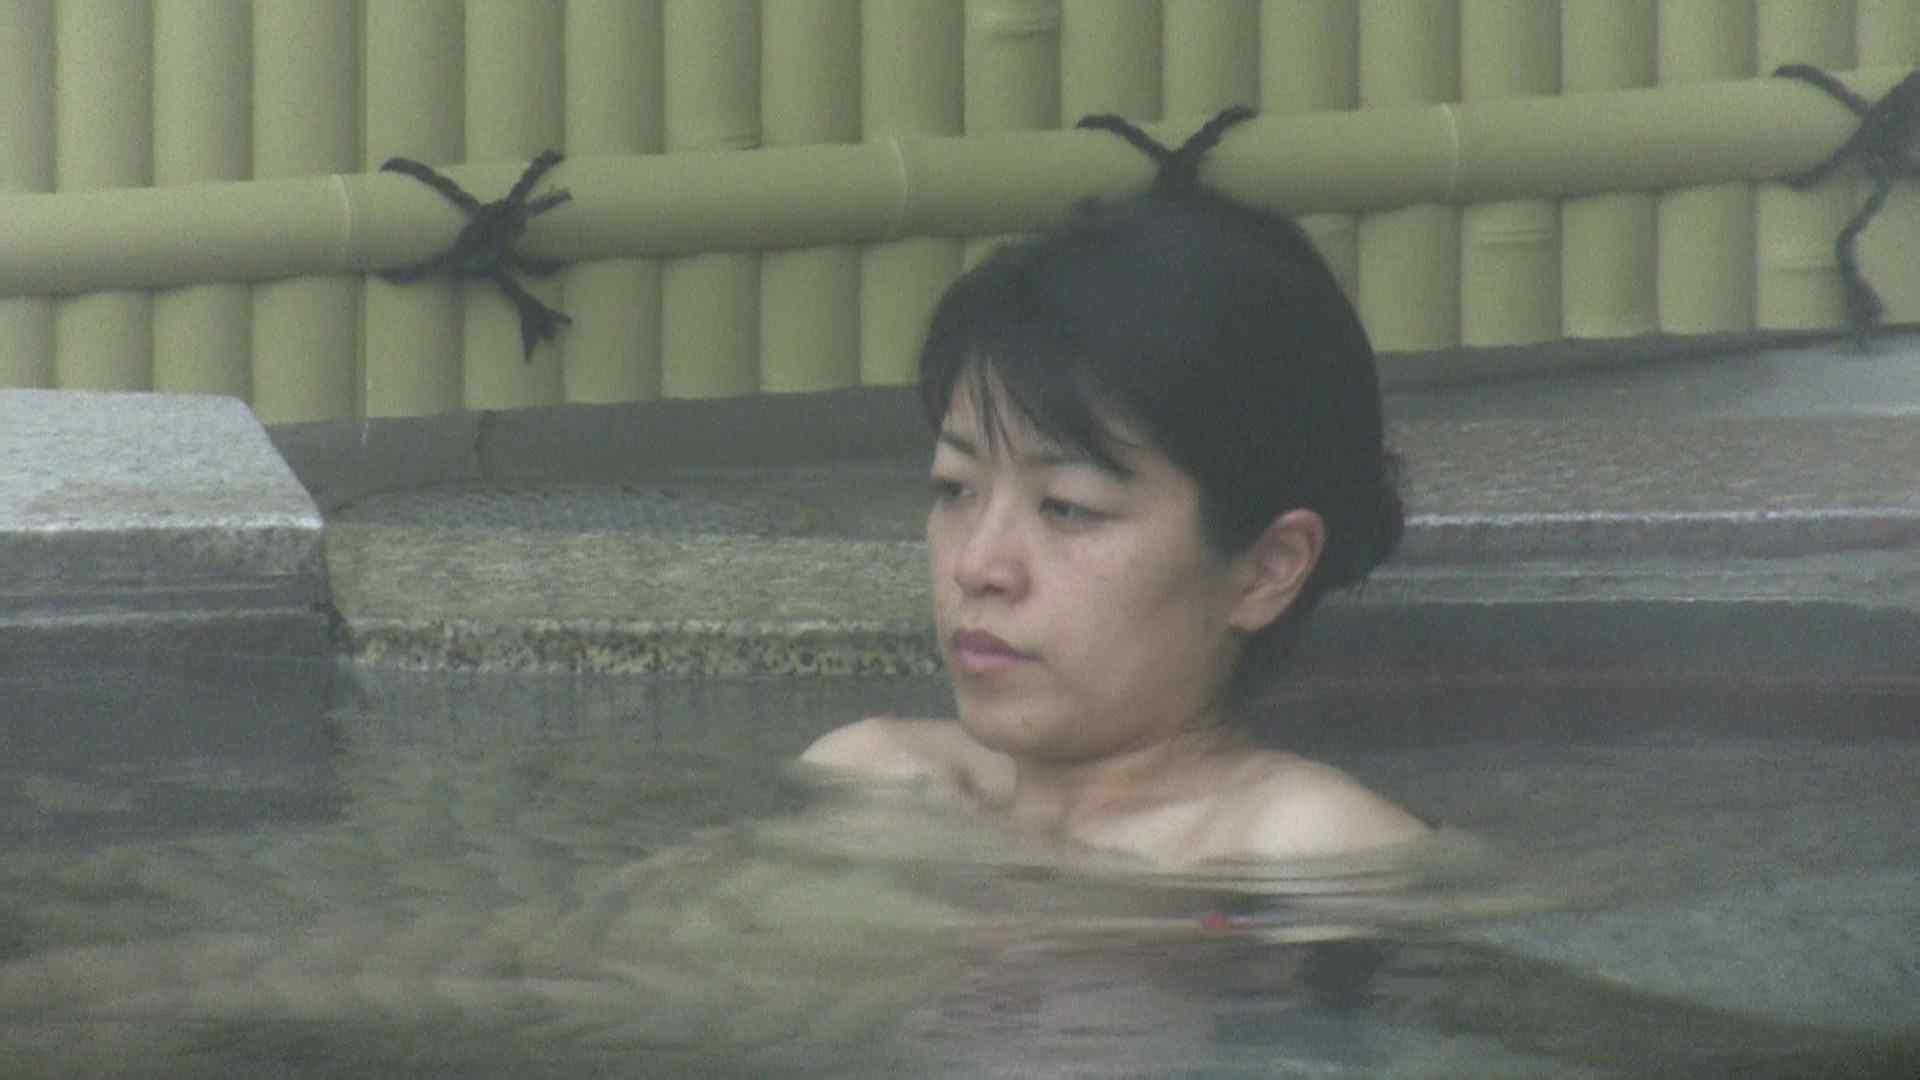 Aquaな露天風呂Vol.585 HなOL | 盗撮  93pic 75